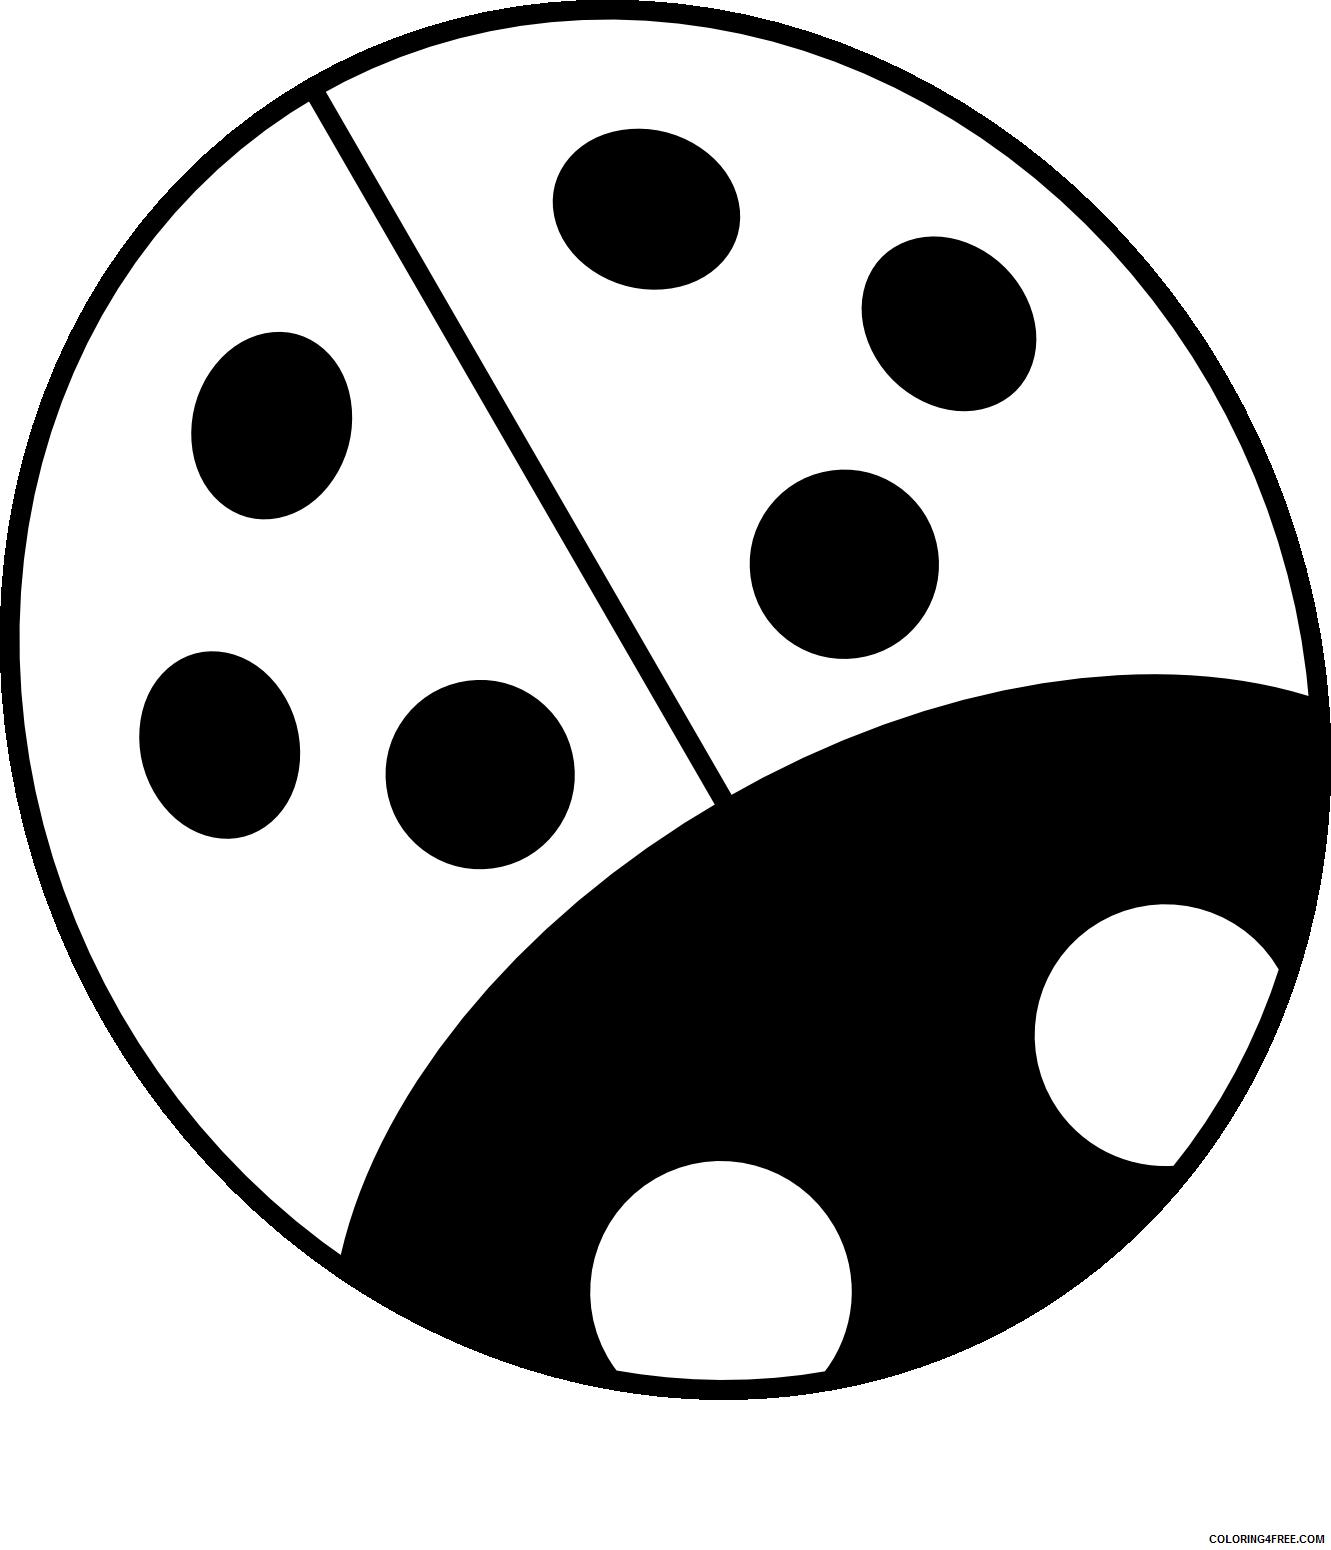 Black and White Ladybug Coloring Pages ladybug Printable Coloring4free